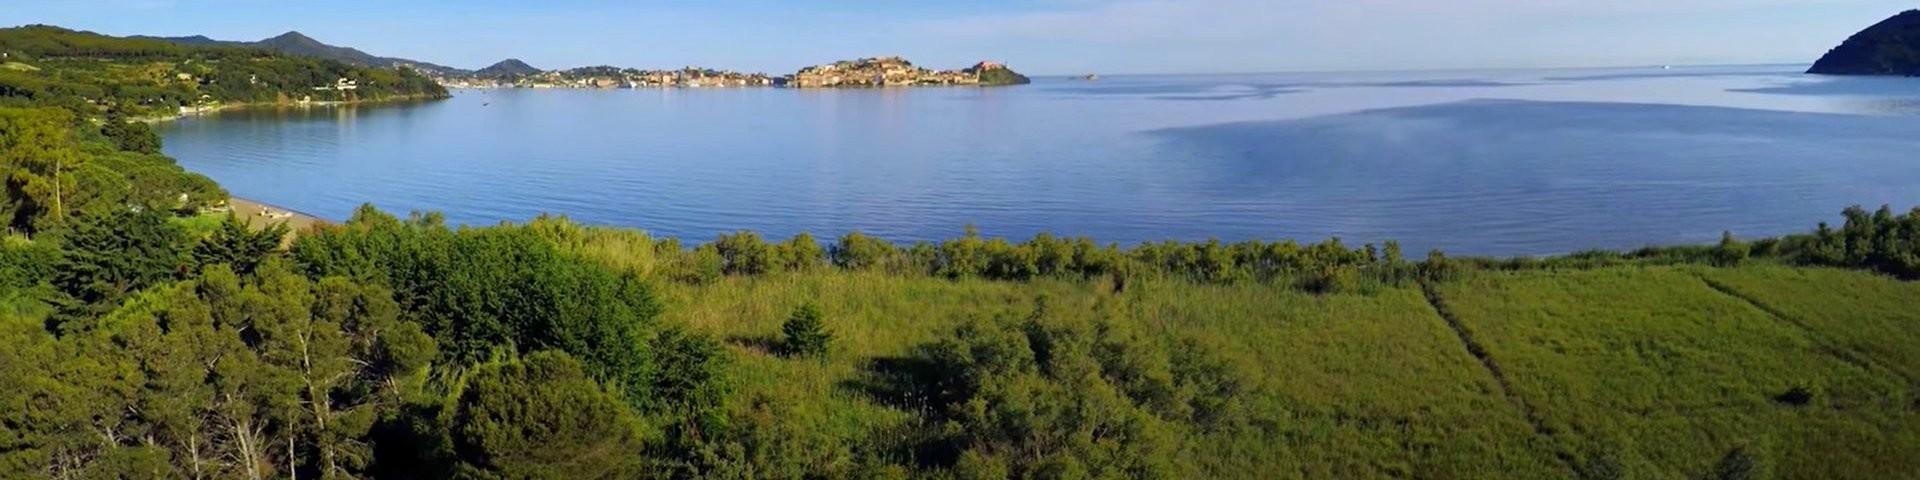 Výhled na Schiopparello a Portoferraio